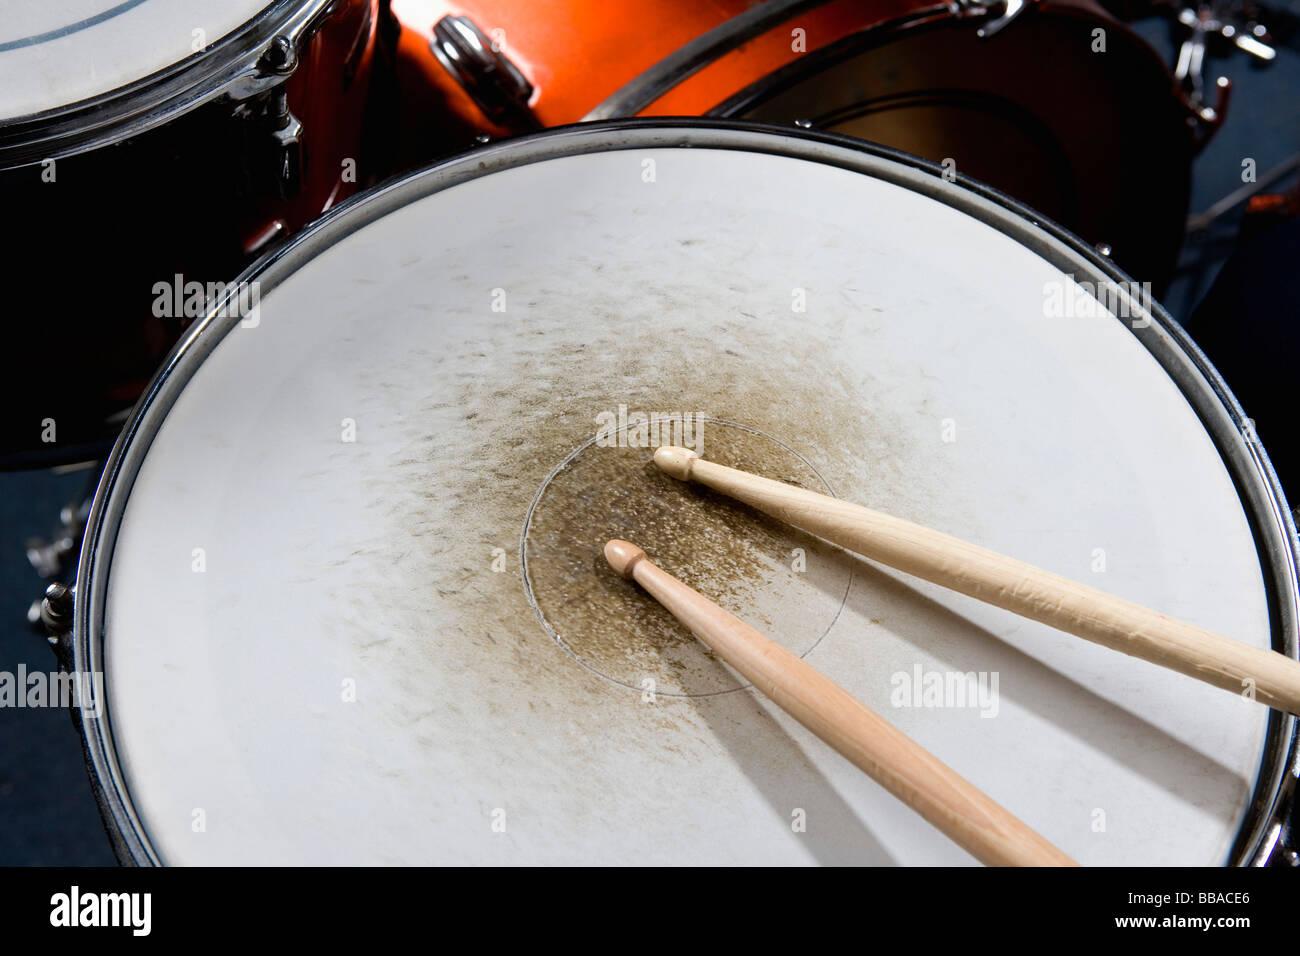 Detail of drumsticks on a drum kit - Stock Image